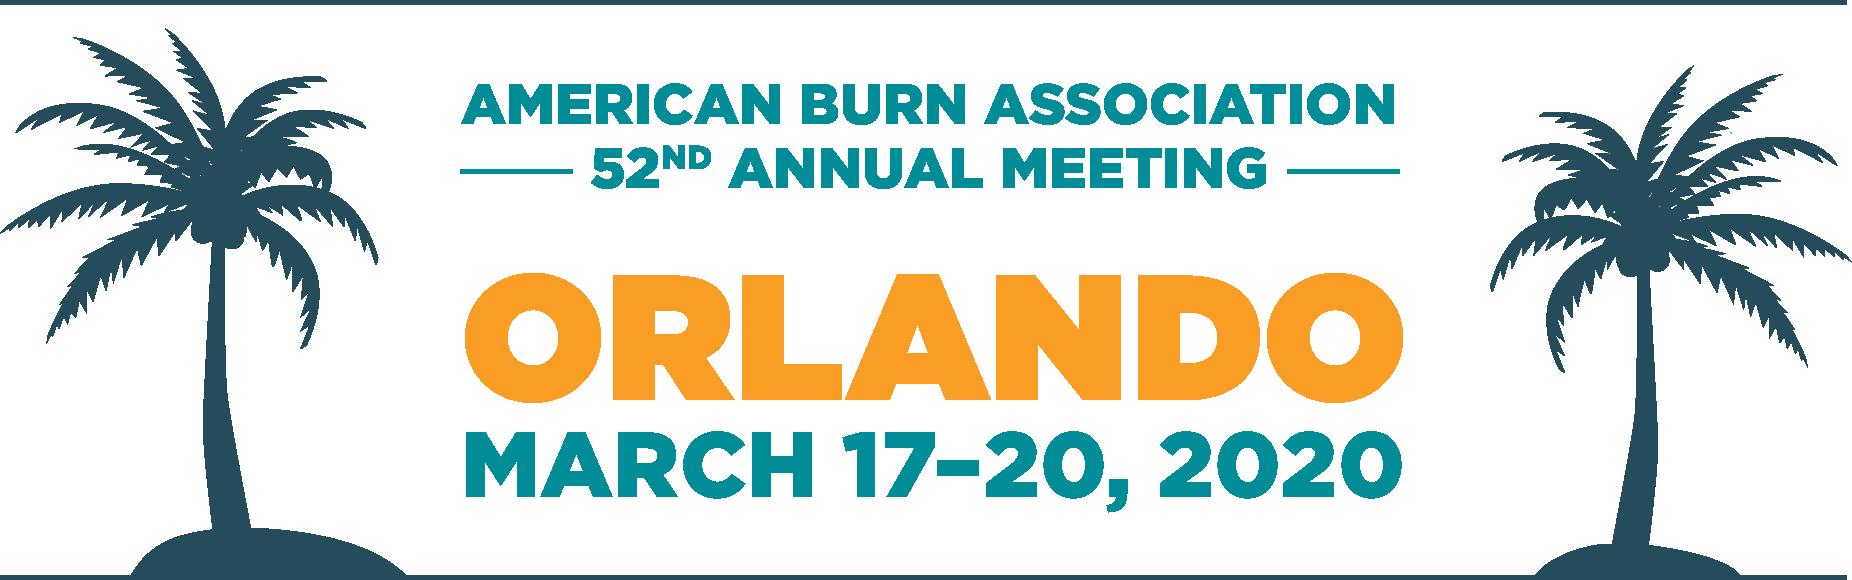 ABA Annual Meeting 2020